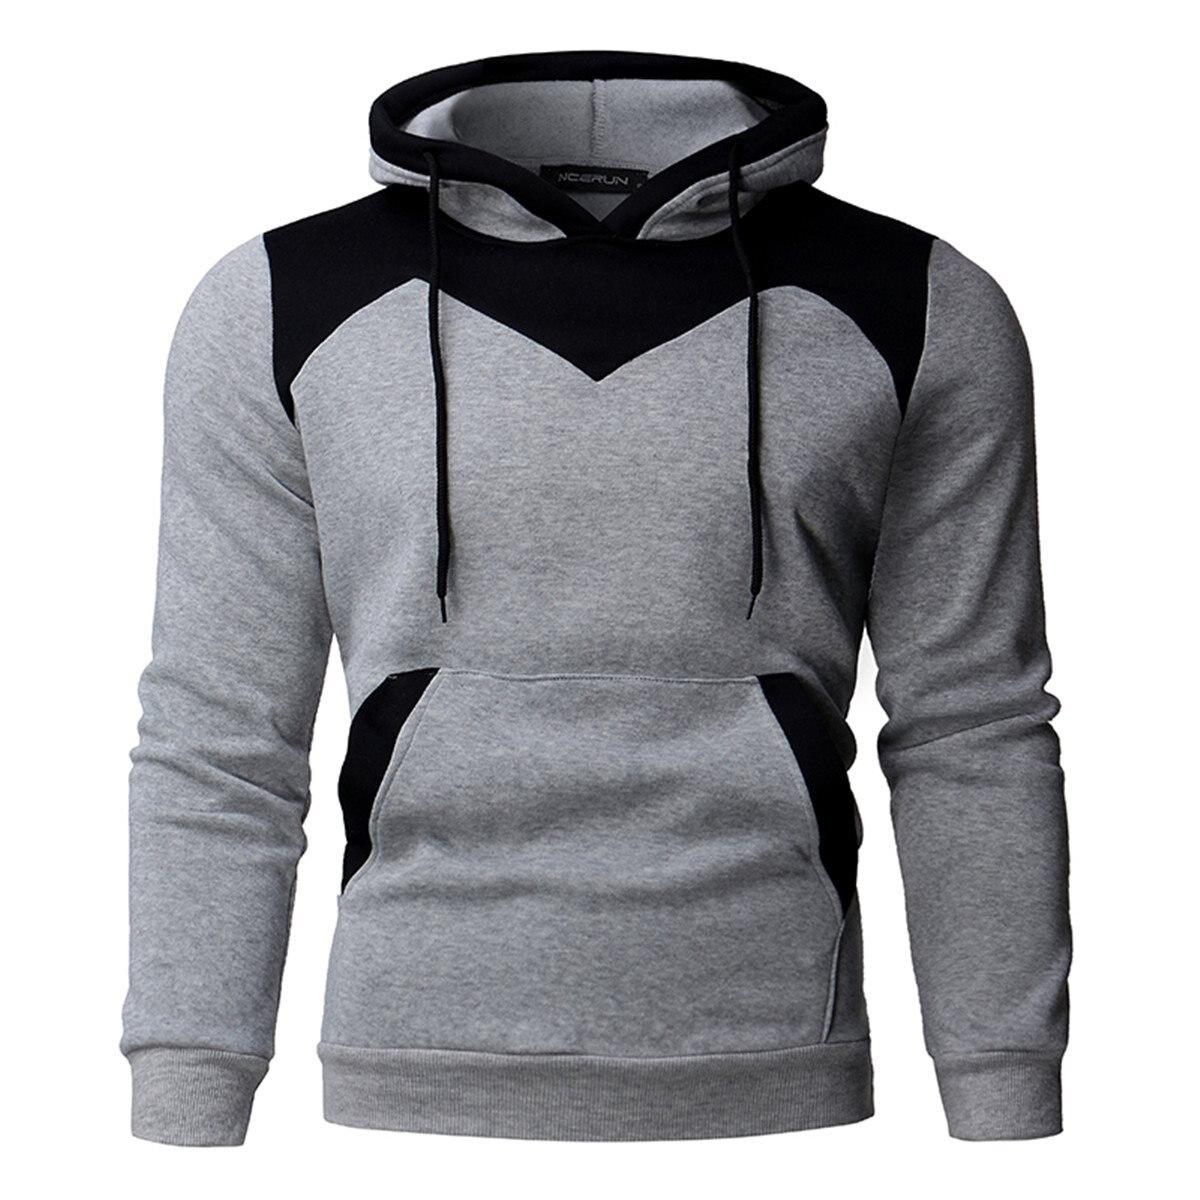 2018 Fleece Hoodies Männer Nähte Samt Trainingsanzug Pullover Herren Slim Fit Langarm Mit Kapuze Sweatshirt Herbst Winter